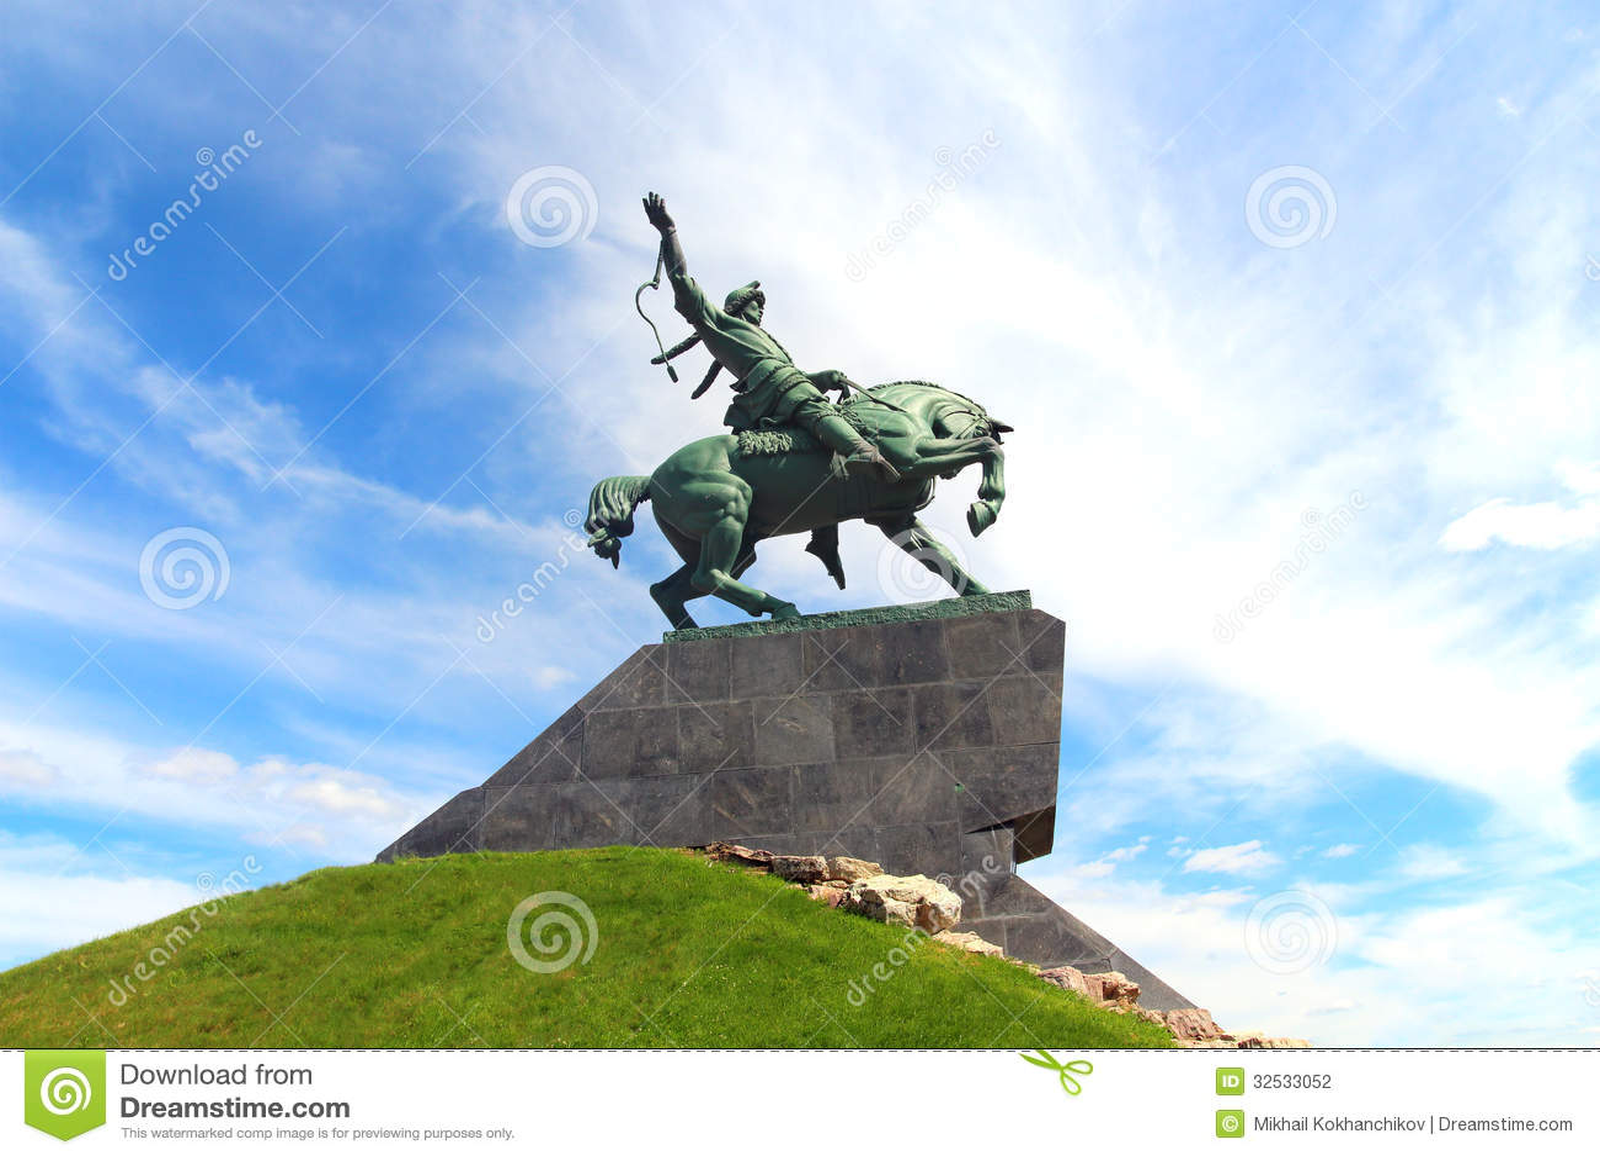 Who is Salavat Yulaev 71